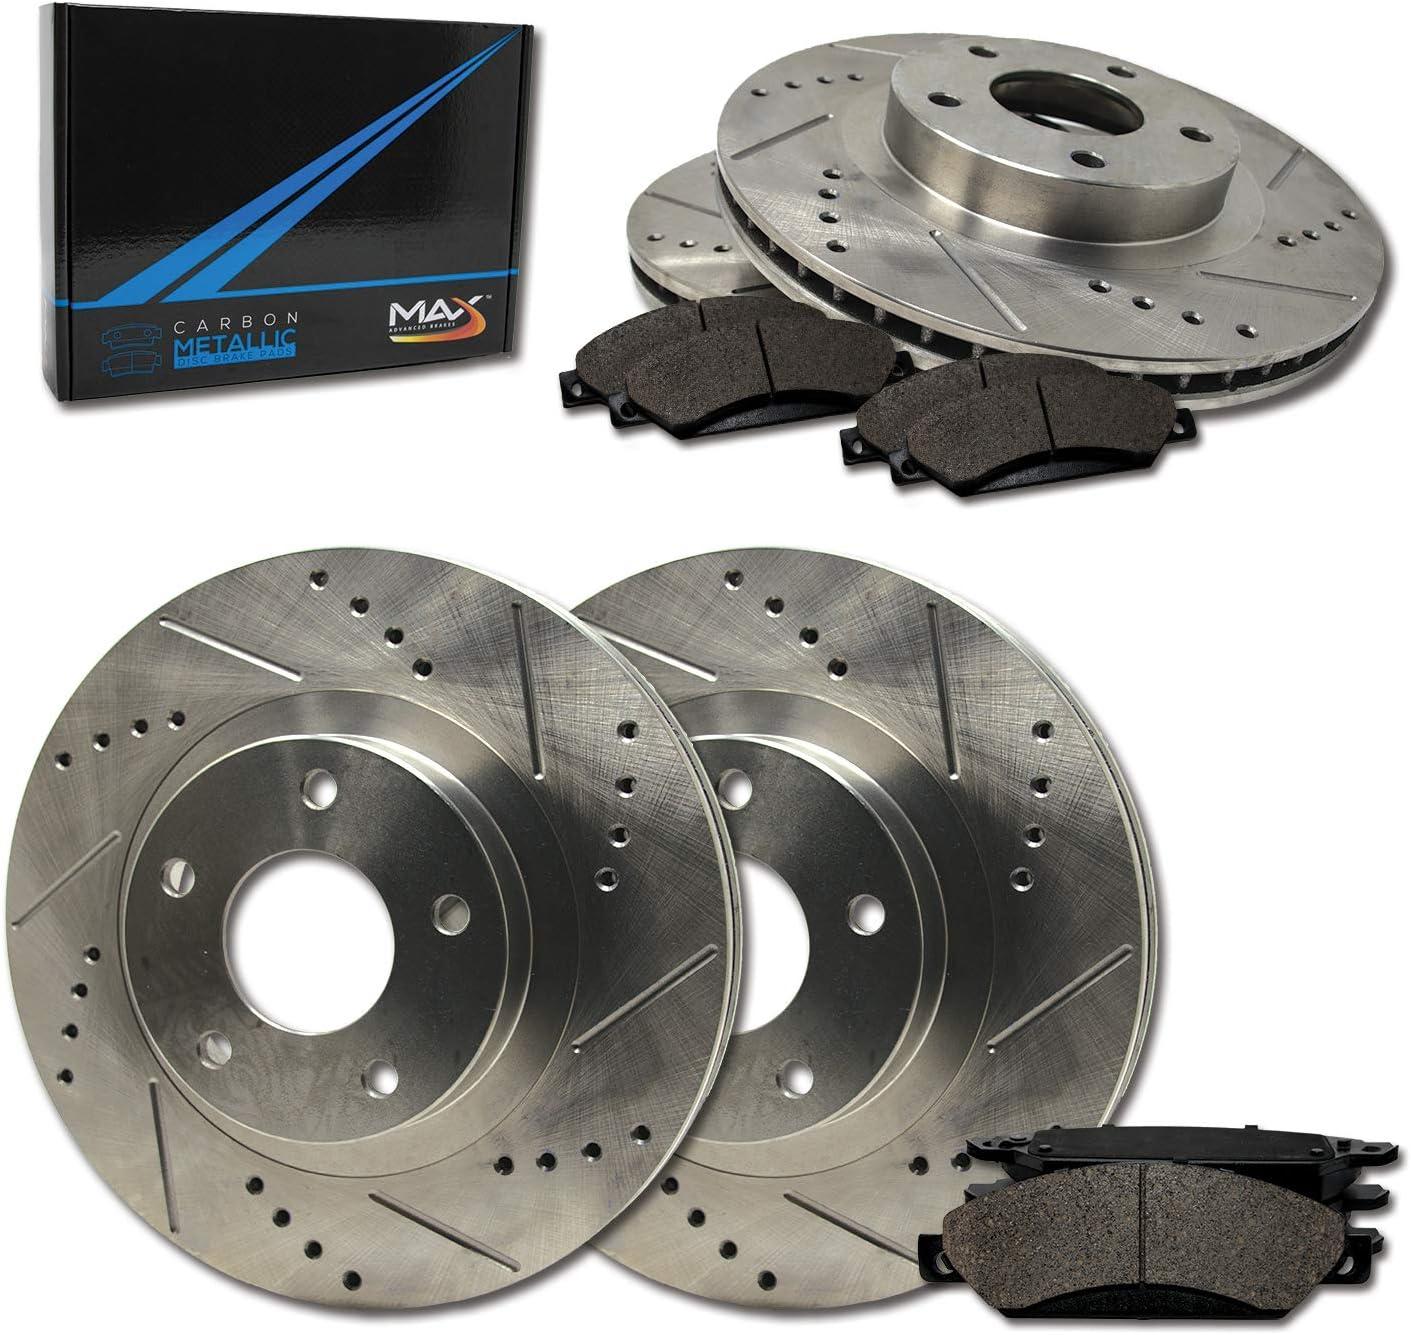 TA078233 Fits: 2013 13 Chevy Silverado 1500 2WD//4WD Models Premium Slotted Drilled Rotors + Metallic Pads Max Brakes Front /& Rear Performance Brake Kit